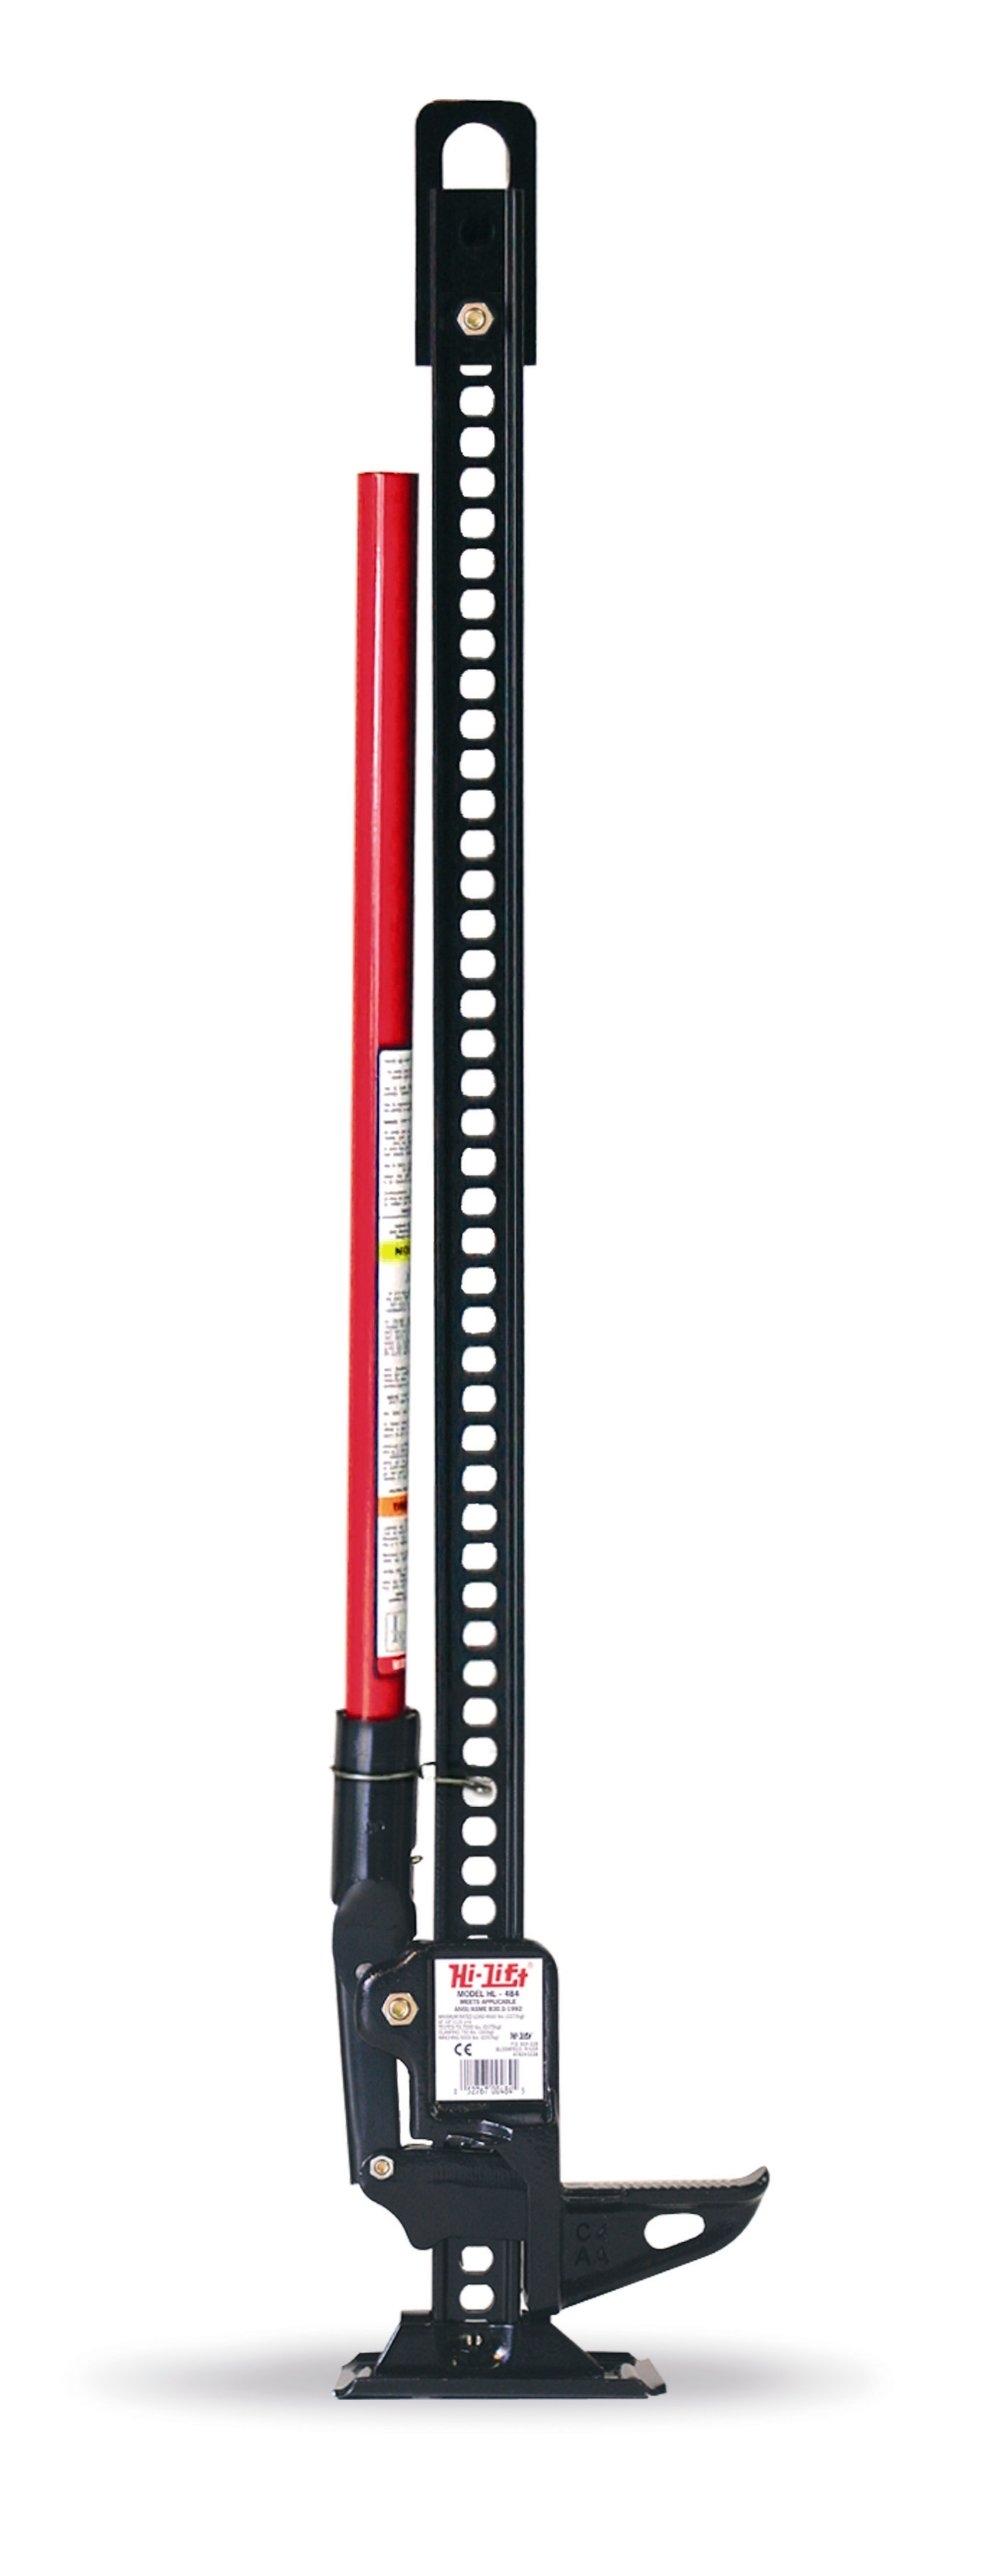 4 ton High Lift Floor Jack Best Rated In Floor Jacks Helpful Customer Reviews Amazon Com